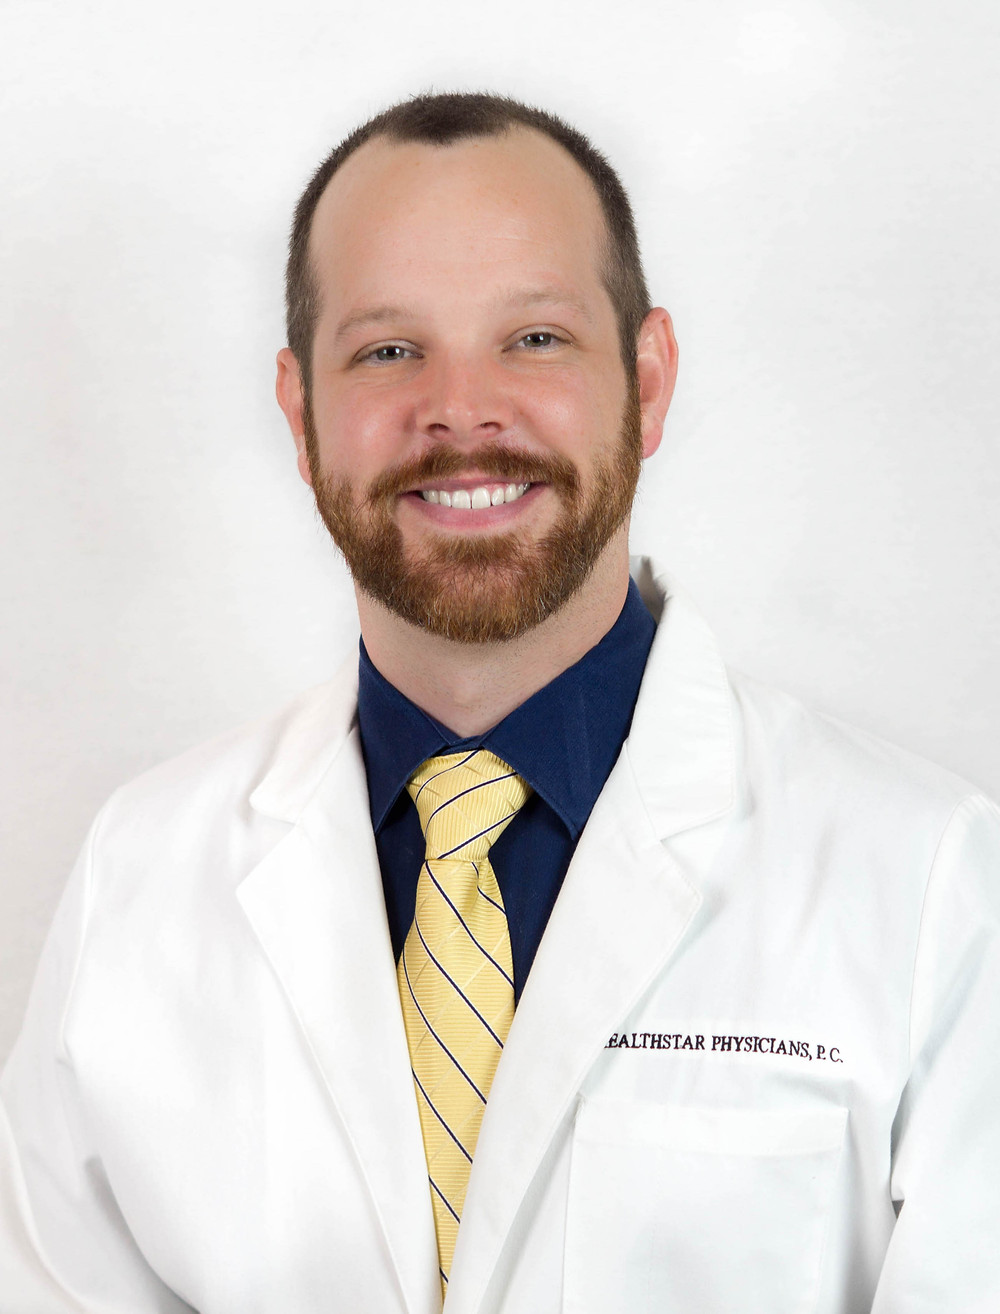 Joseph Prohaska, Dermatologist